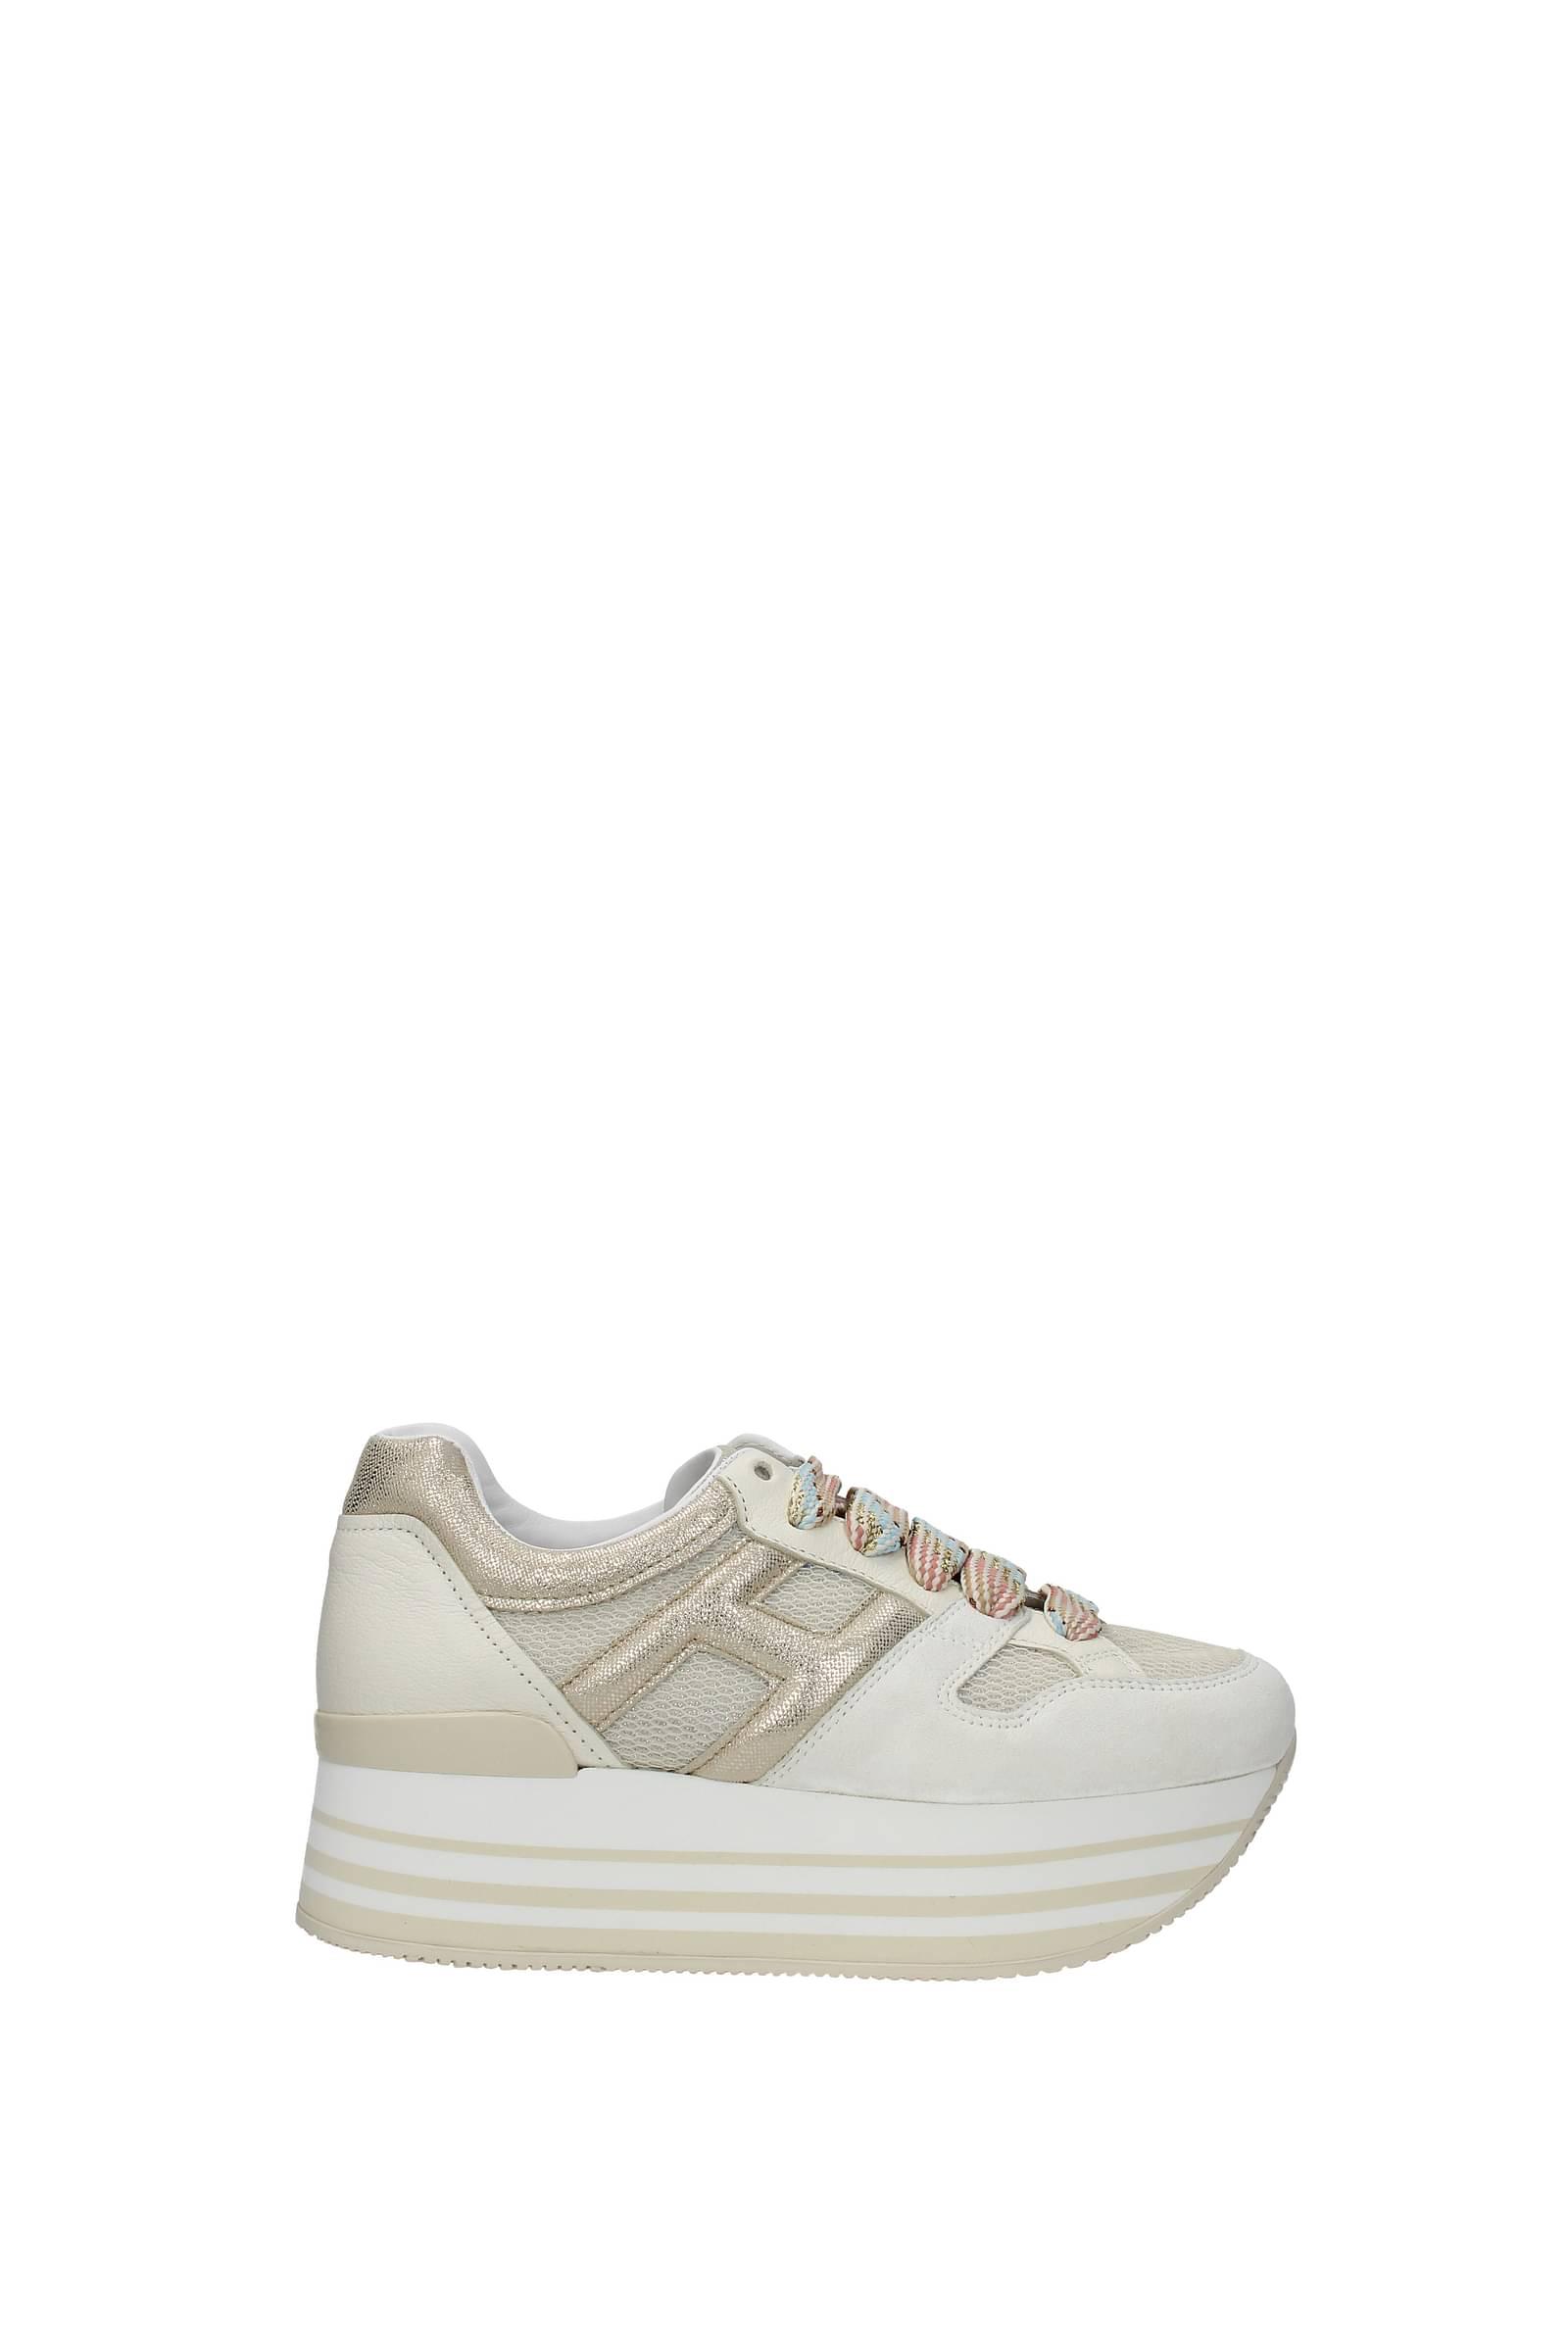 Hogan Sneakers maxi 222 Donna HXW2830U352N8H0QQT Tessuto 218,4€